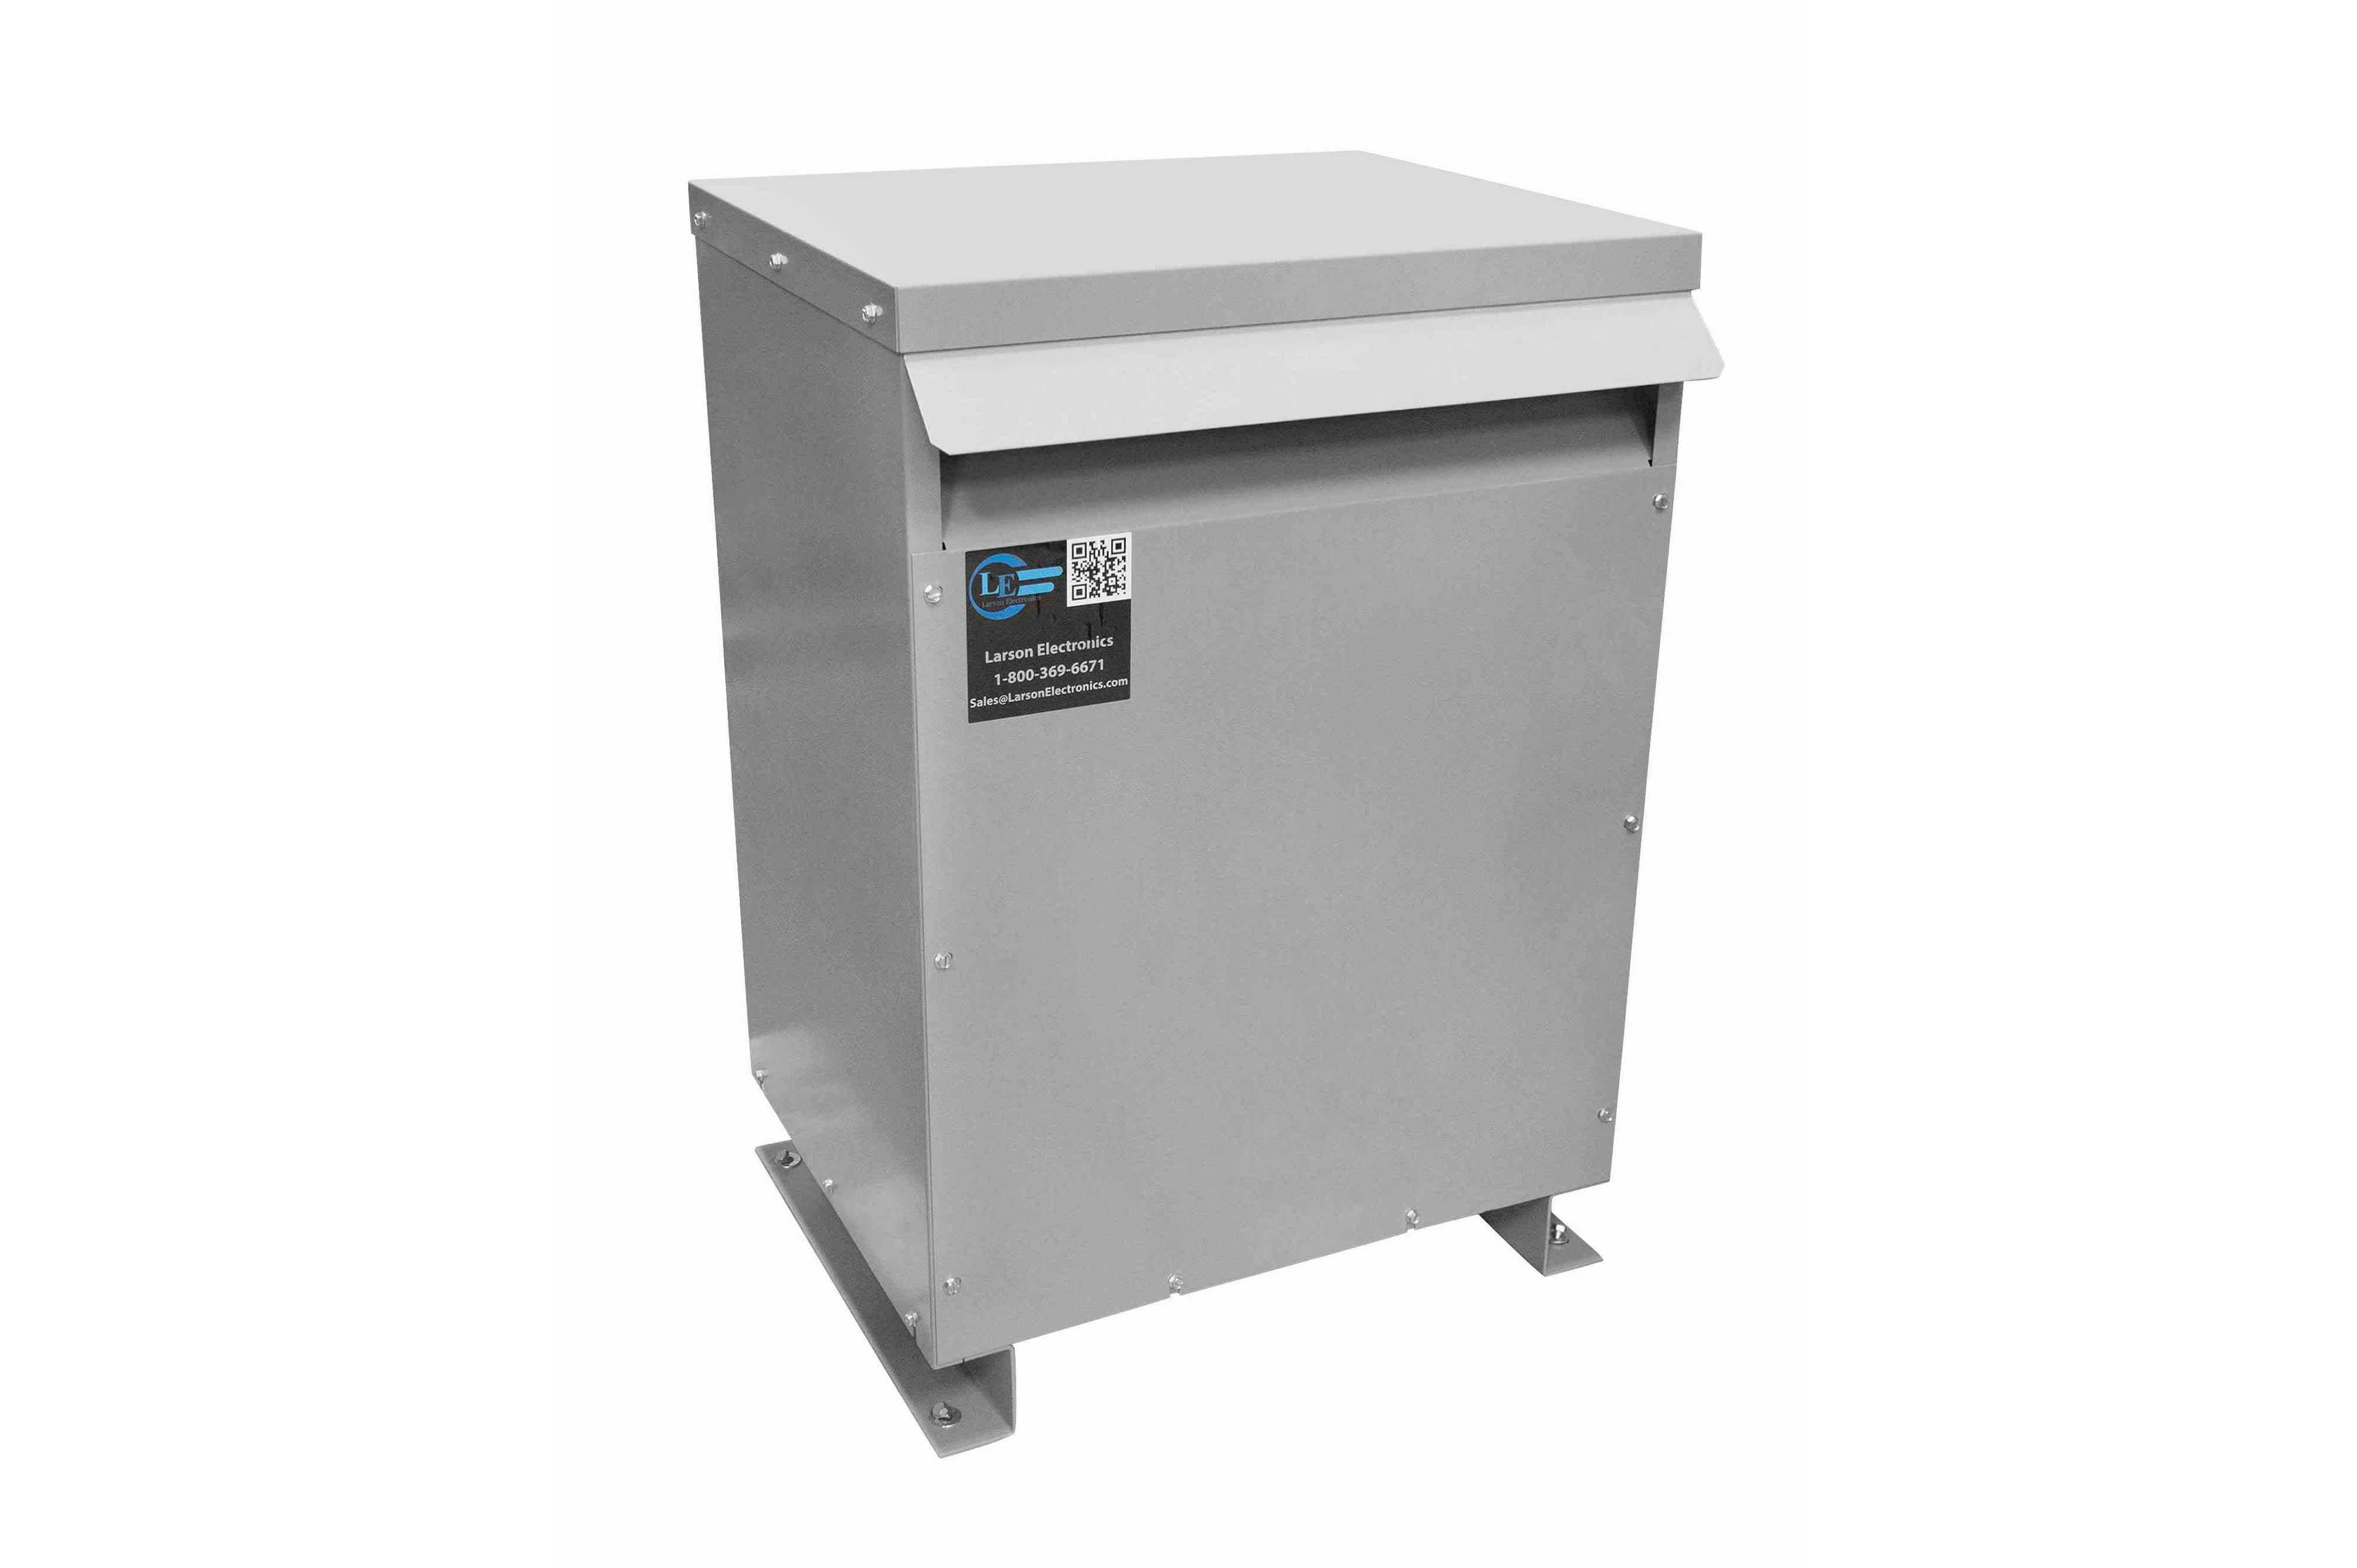 20 kVA 3PH Isolation Transformer, 400V Wye Primary, 480Y/277 Wye-N Secondary, N3R, Ventilated, 60 Hz